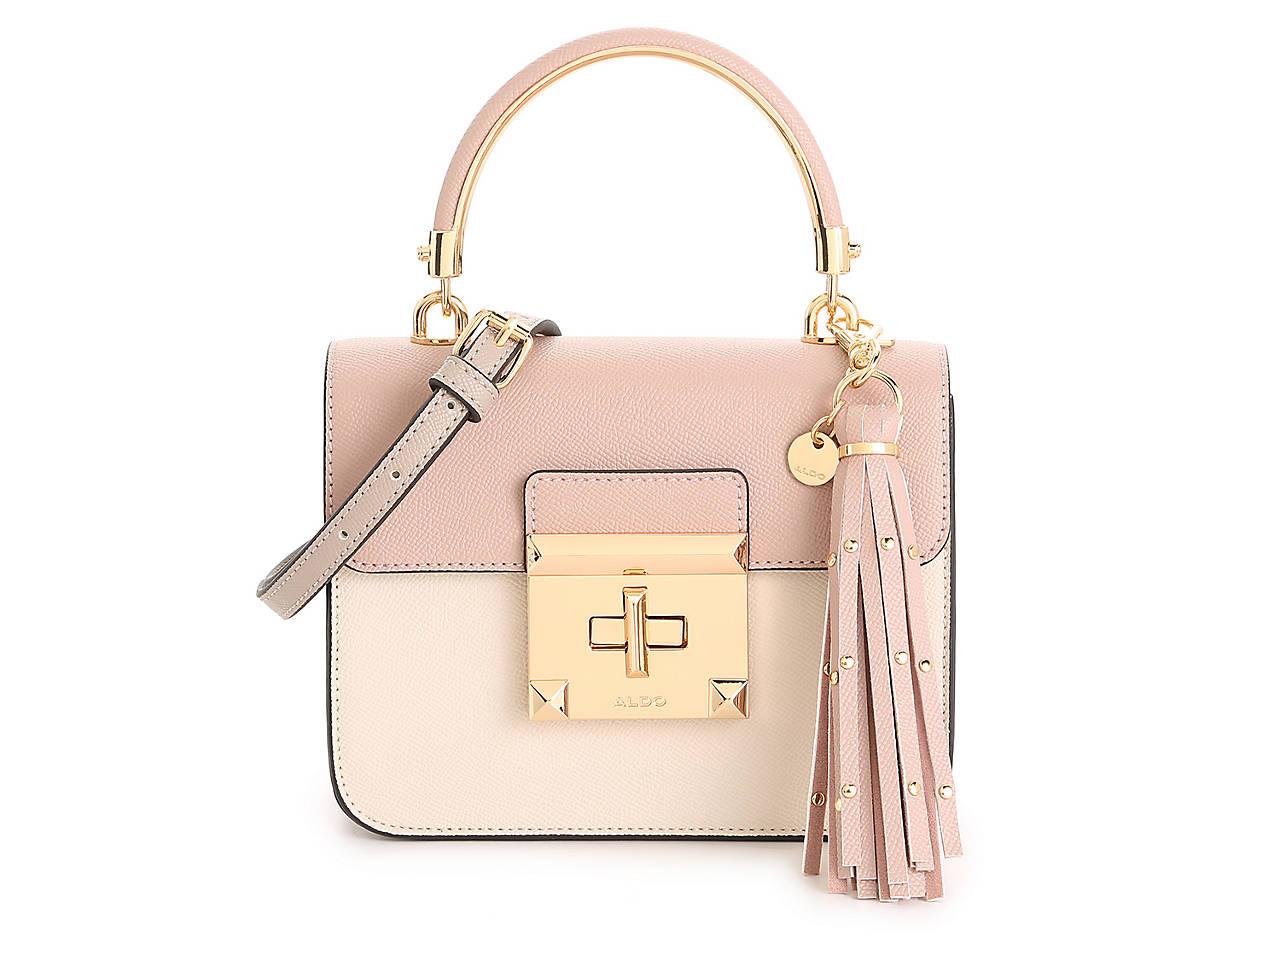 4c11c5c7afc3 Aldo Madone Mini Satchel Women's Handbags & Accessories | DSW